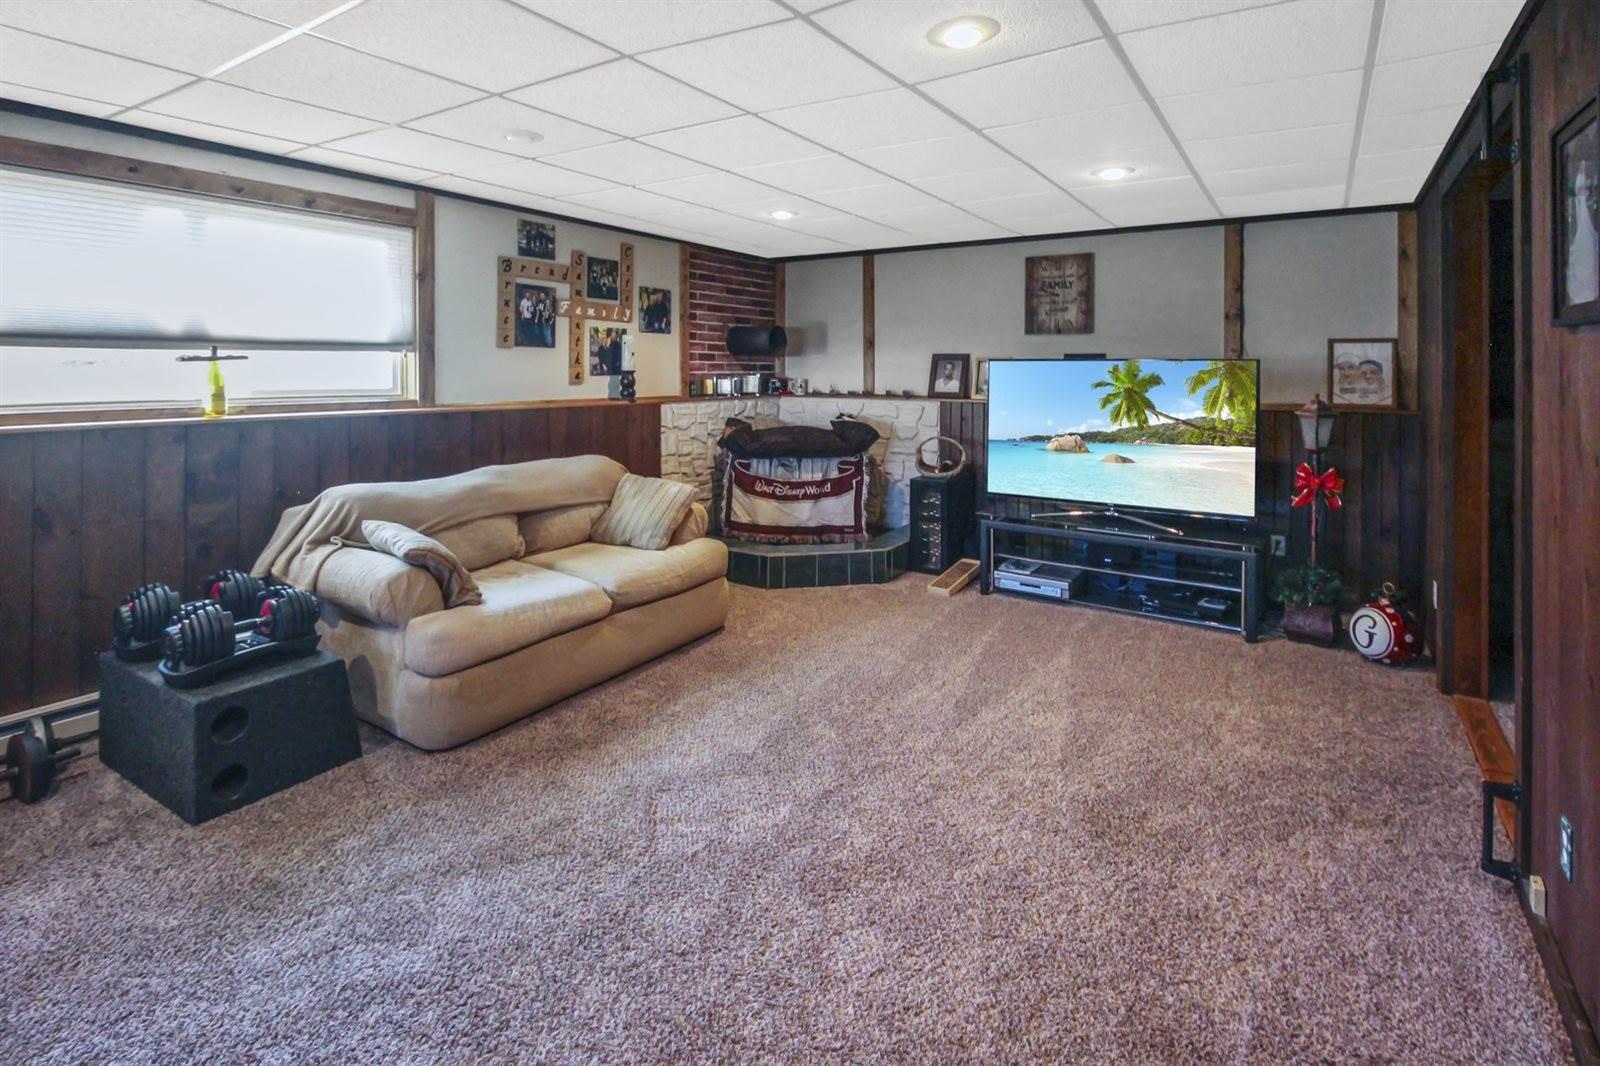 2119 Sunset Drive, Freeport, IL 61032